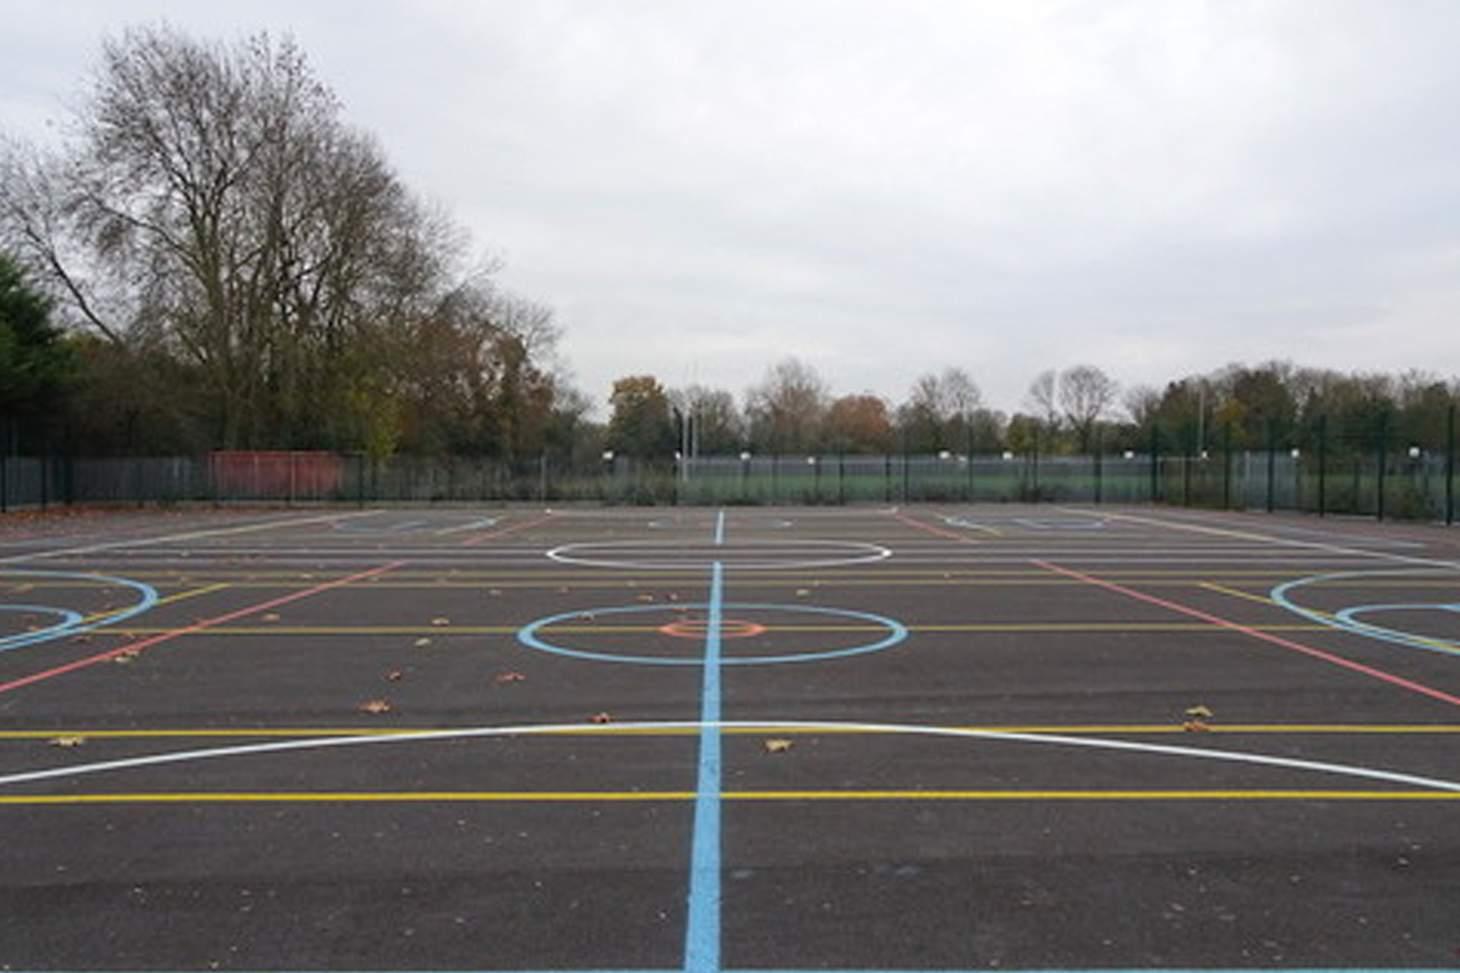 Orchardside School Outdoor | Hard (macadam) netball court